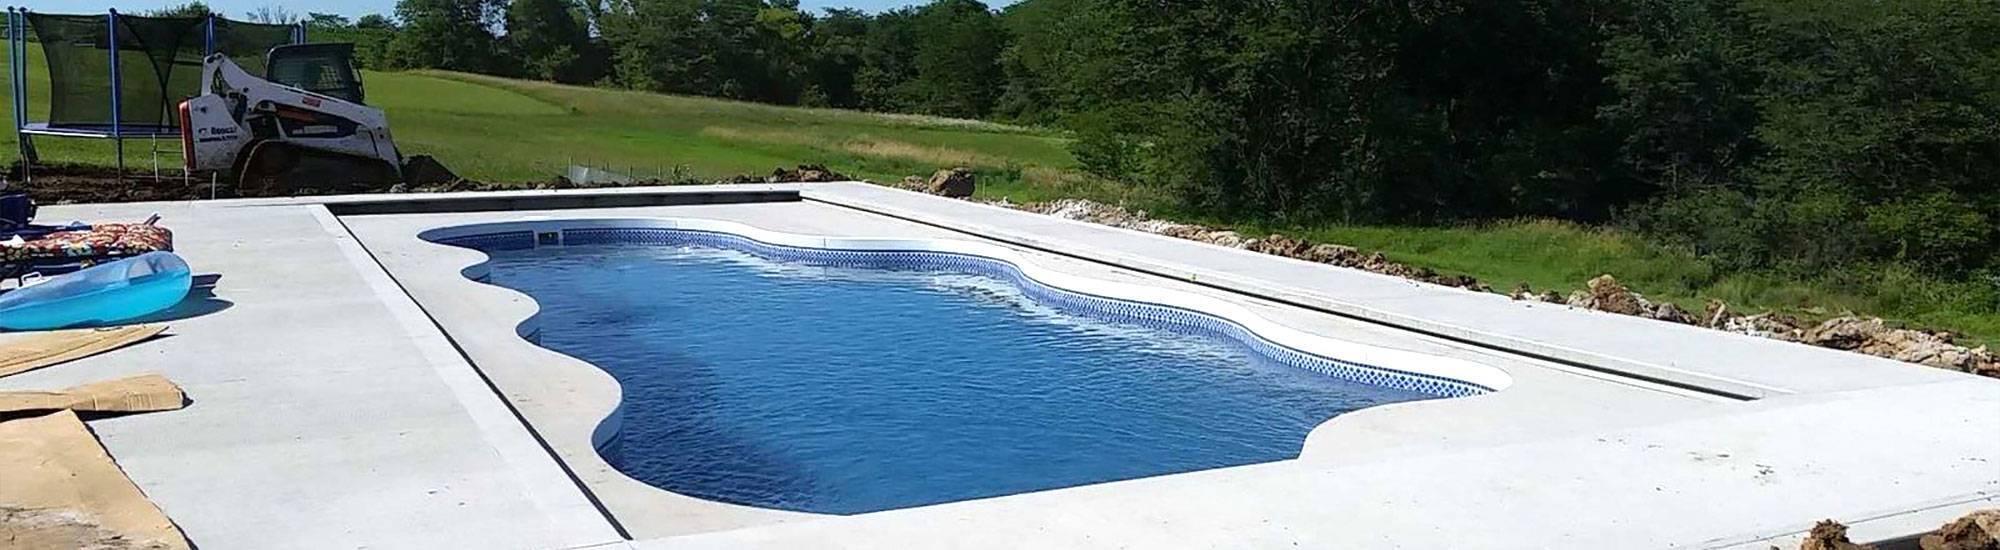 Cmc Pools Of Iowa Inground Swimming Companies Central Fibergl Des Moines Area